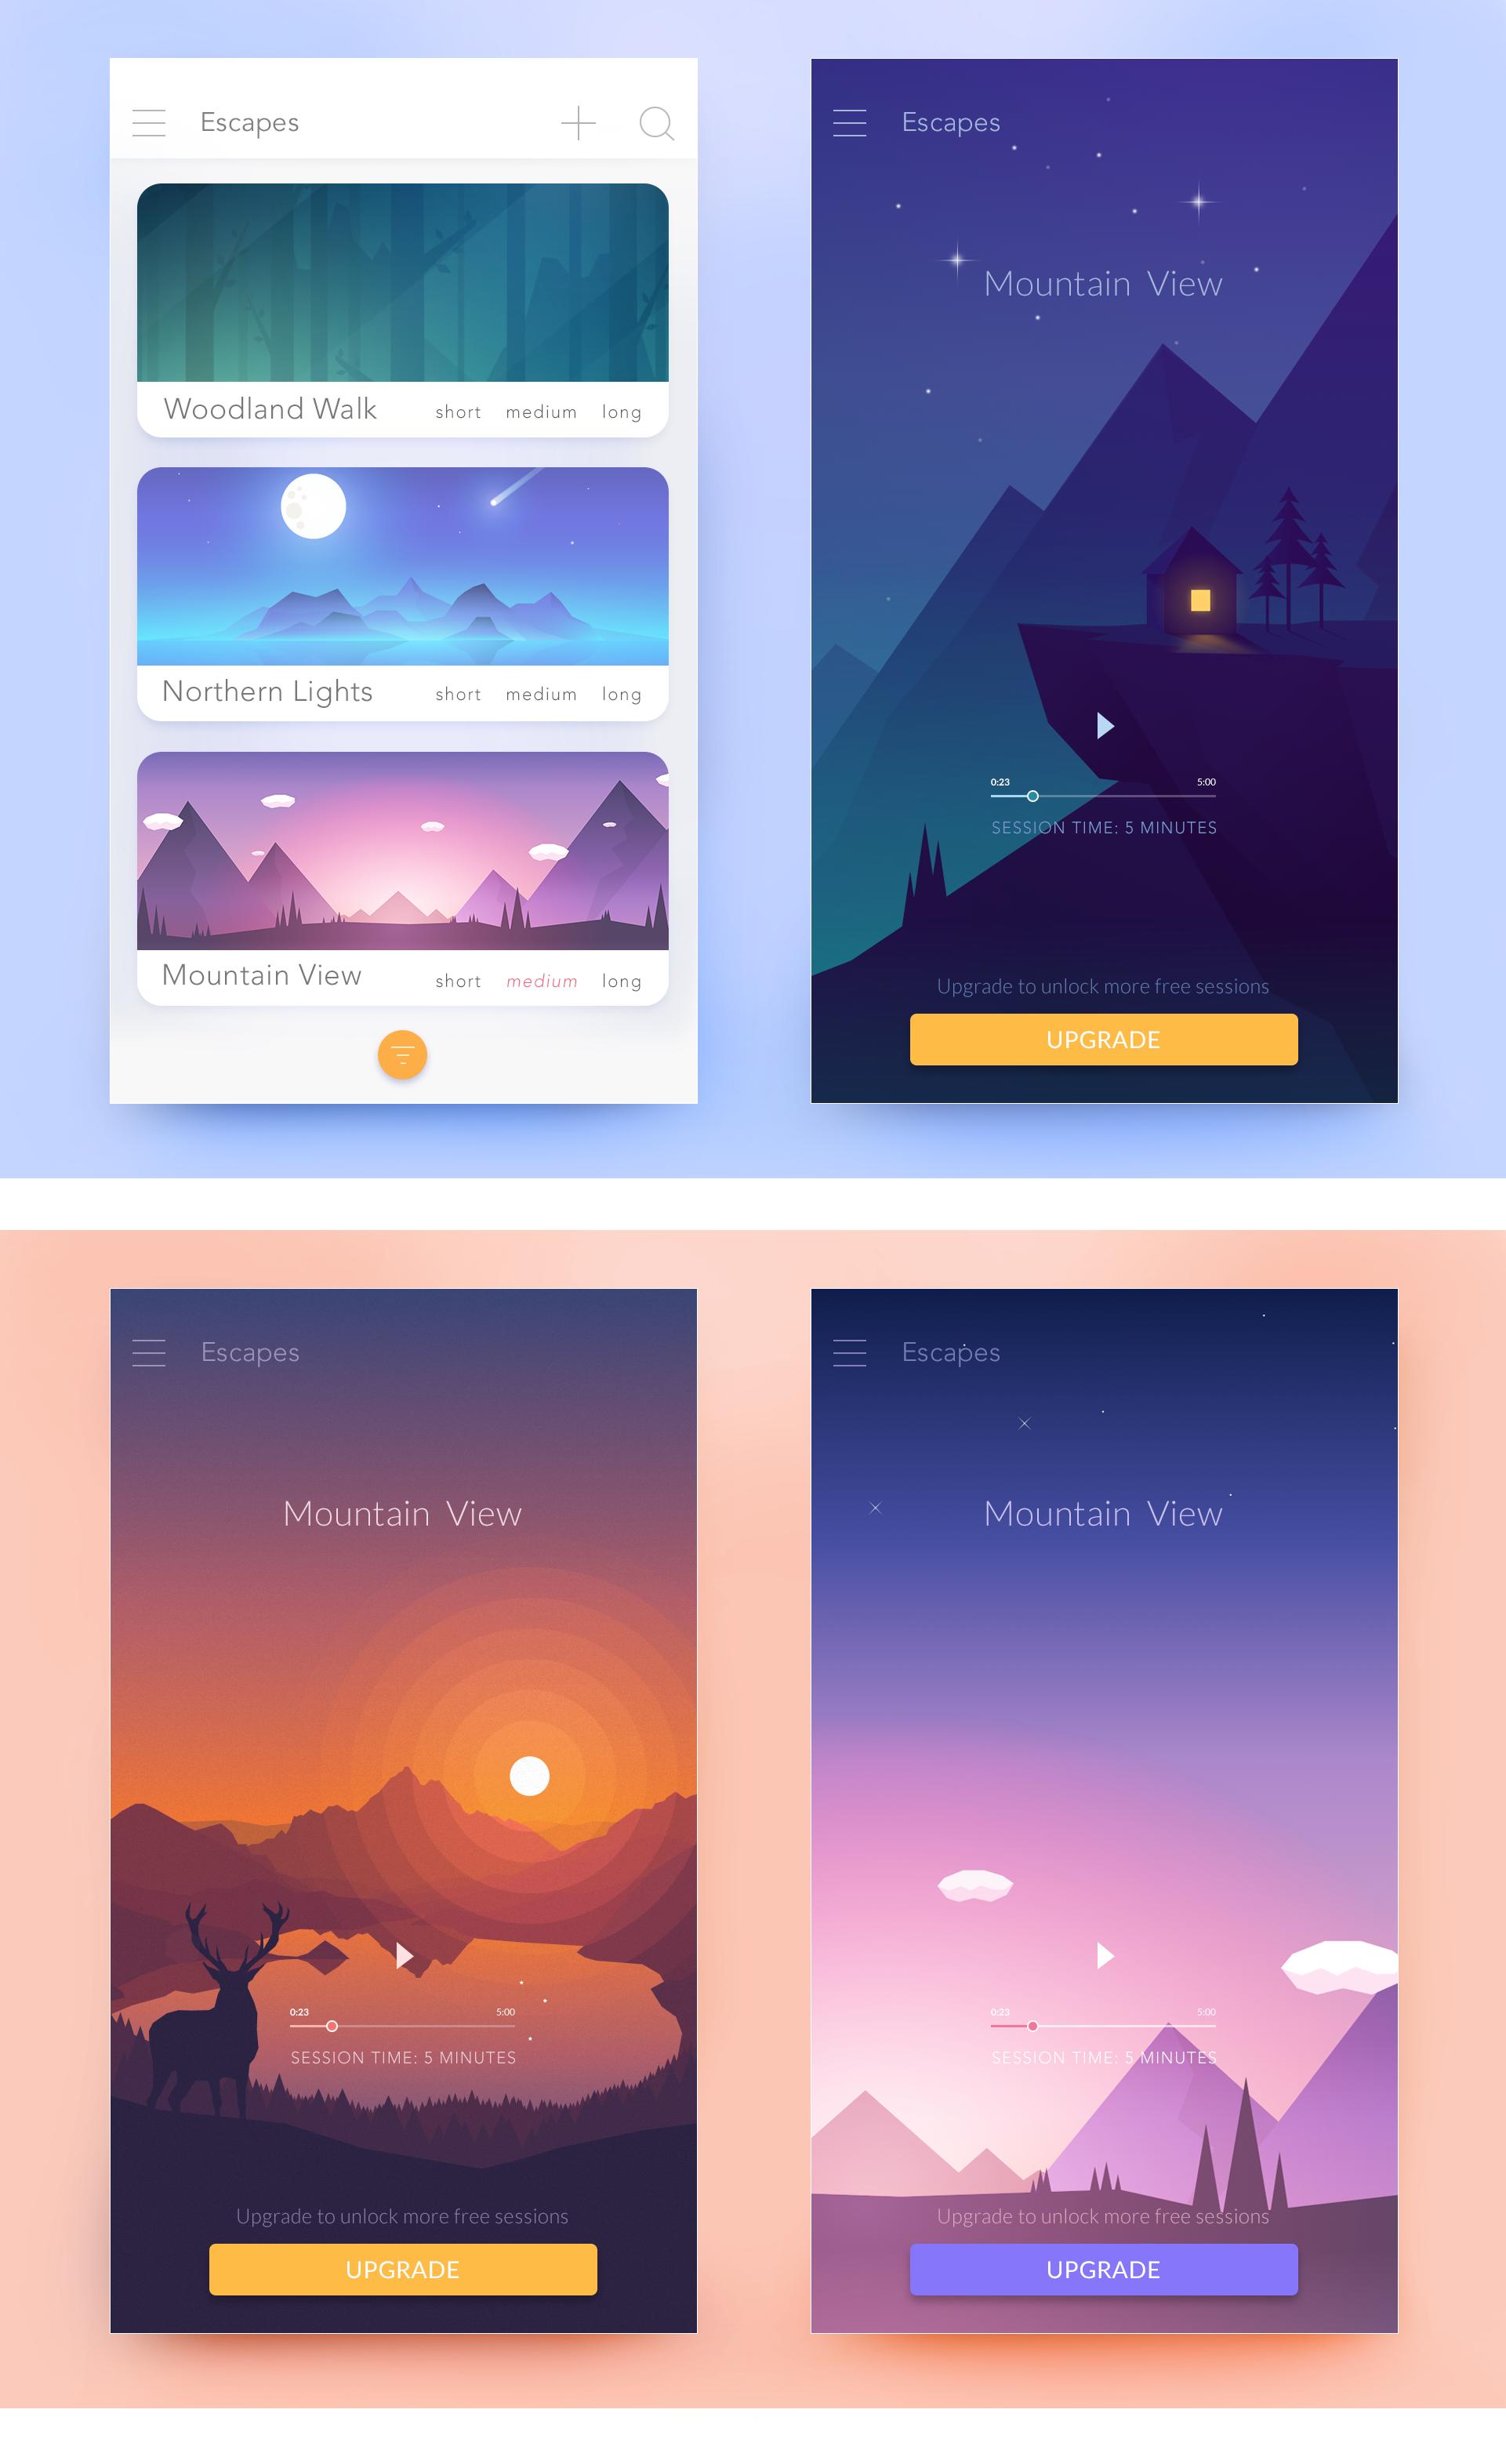 Meditation App UI design | App design contest #interfacedesign